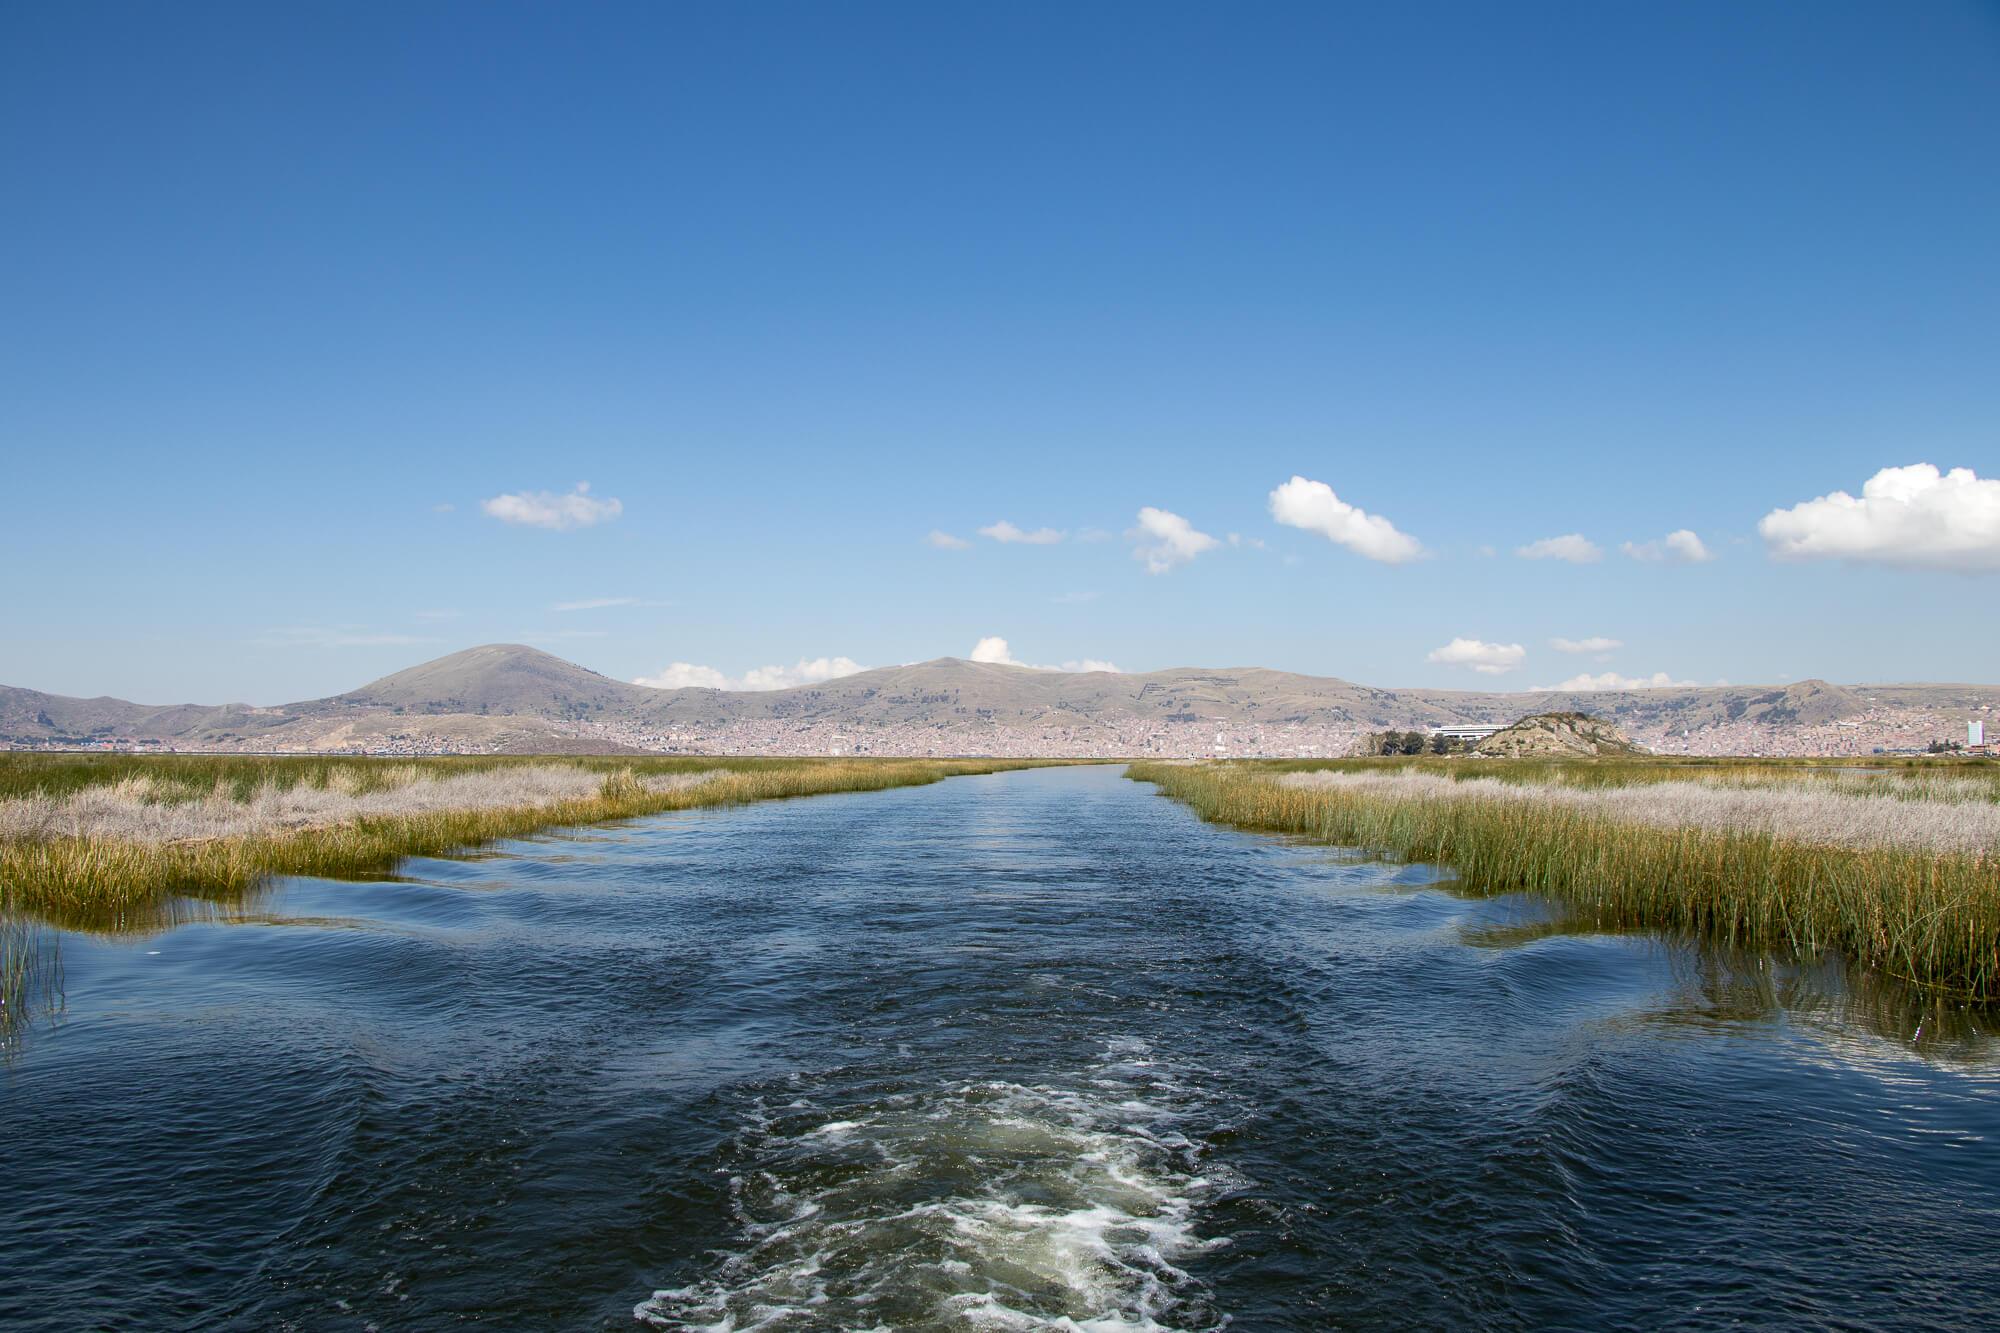 Visite du Lac Titicaca à Puno au Pérou